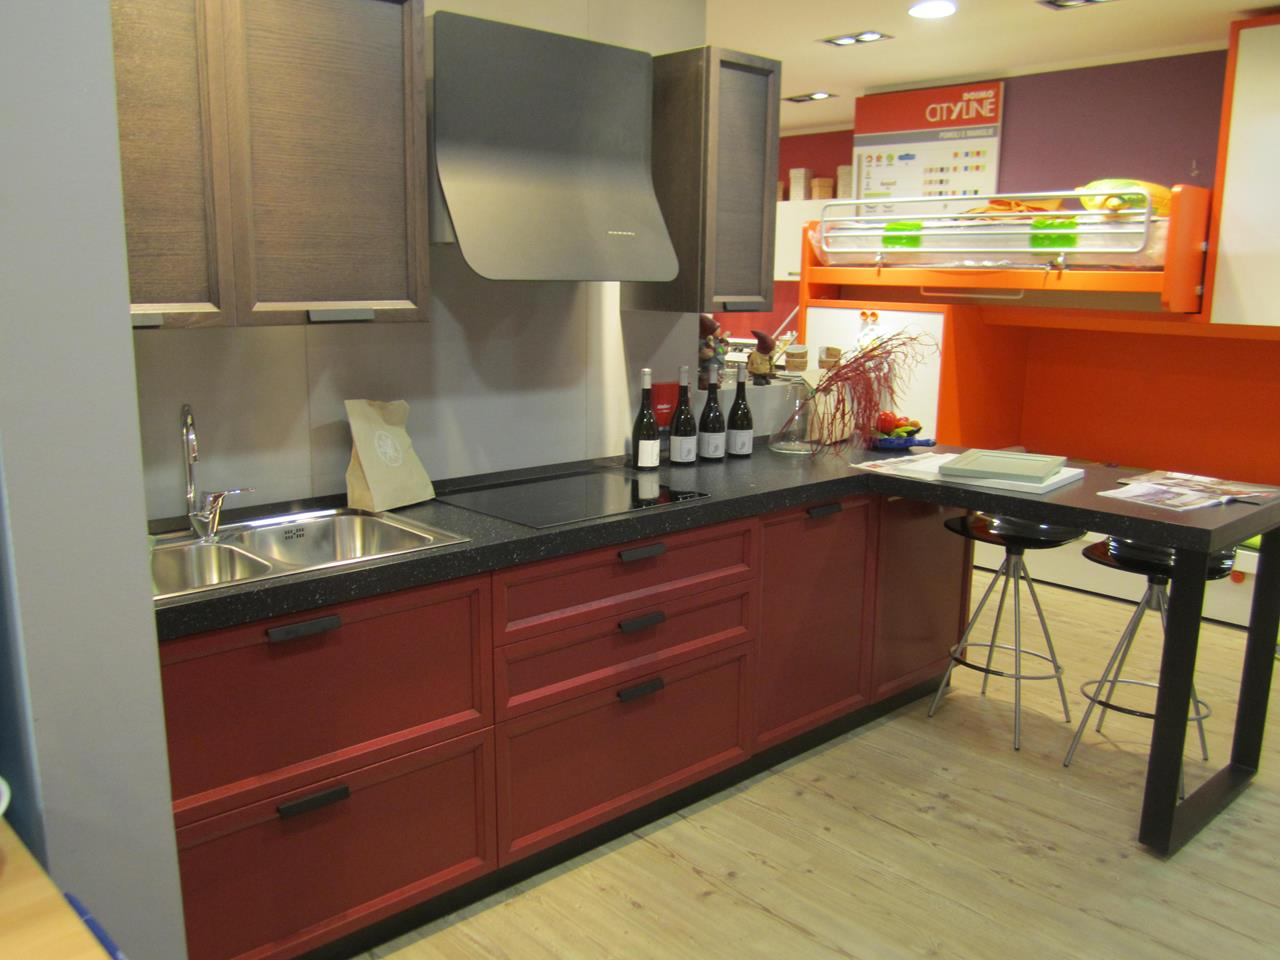 Cucine nuoro - Net cucine new smart ...